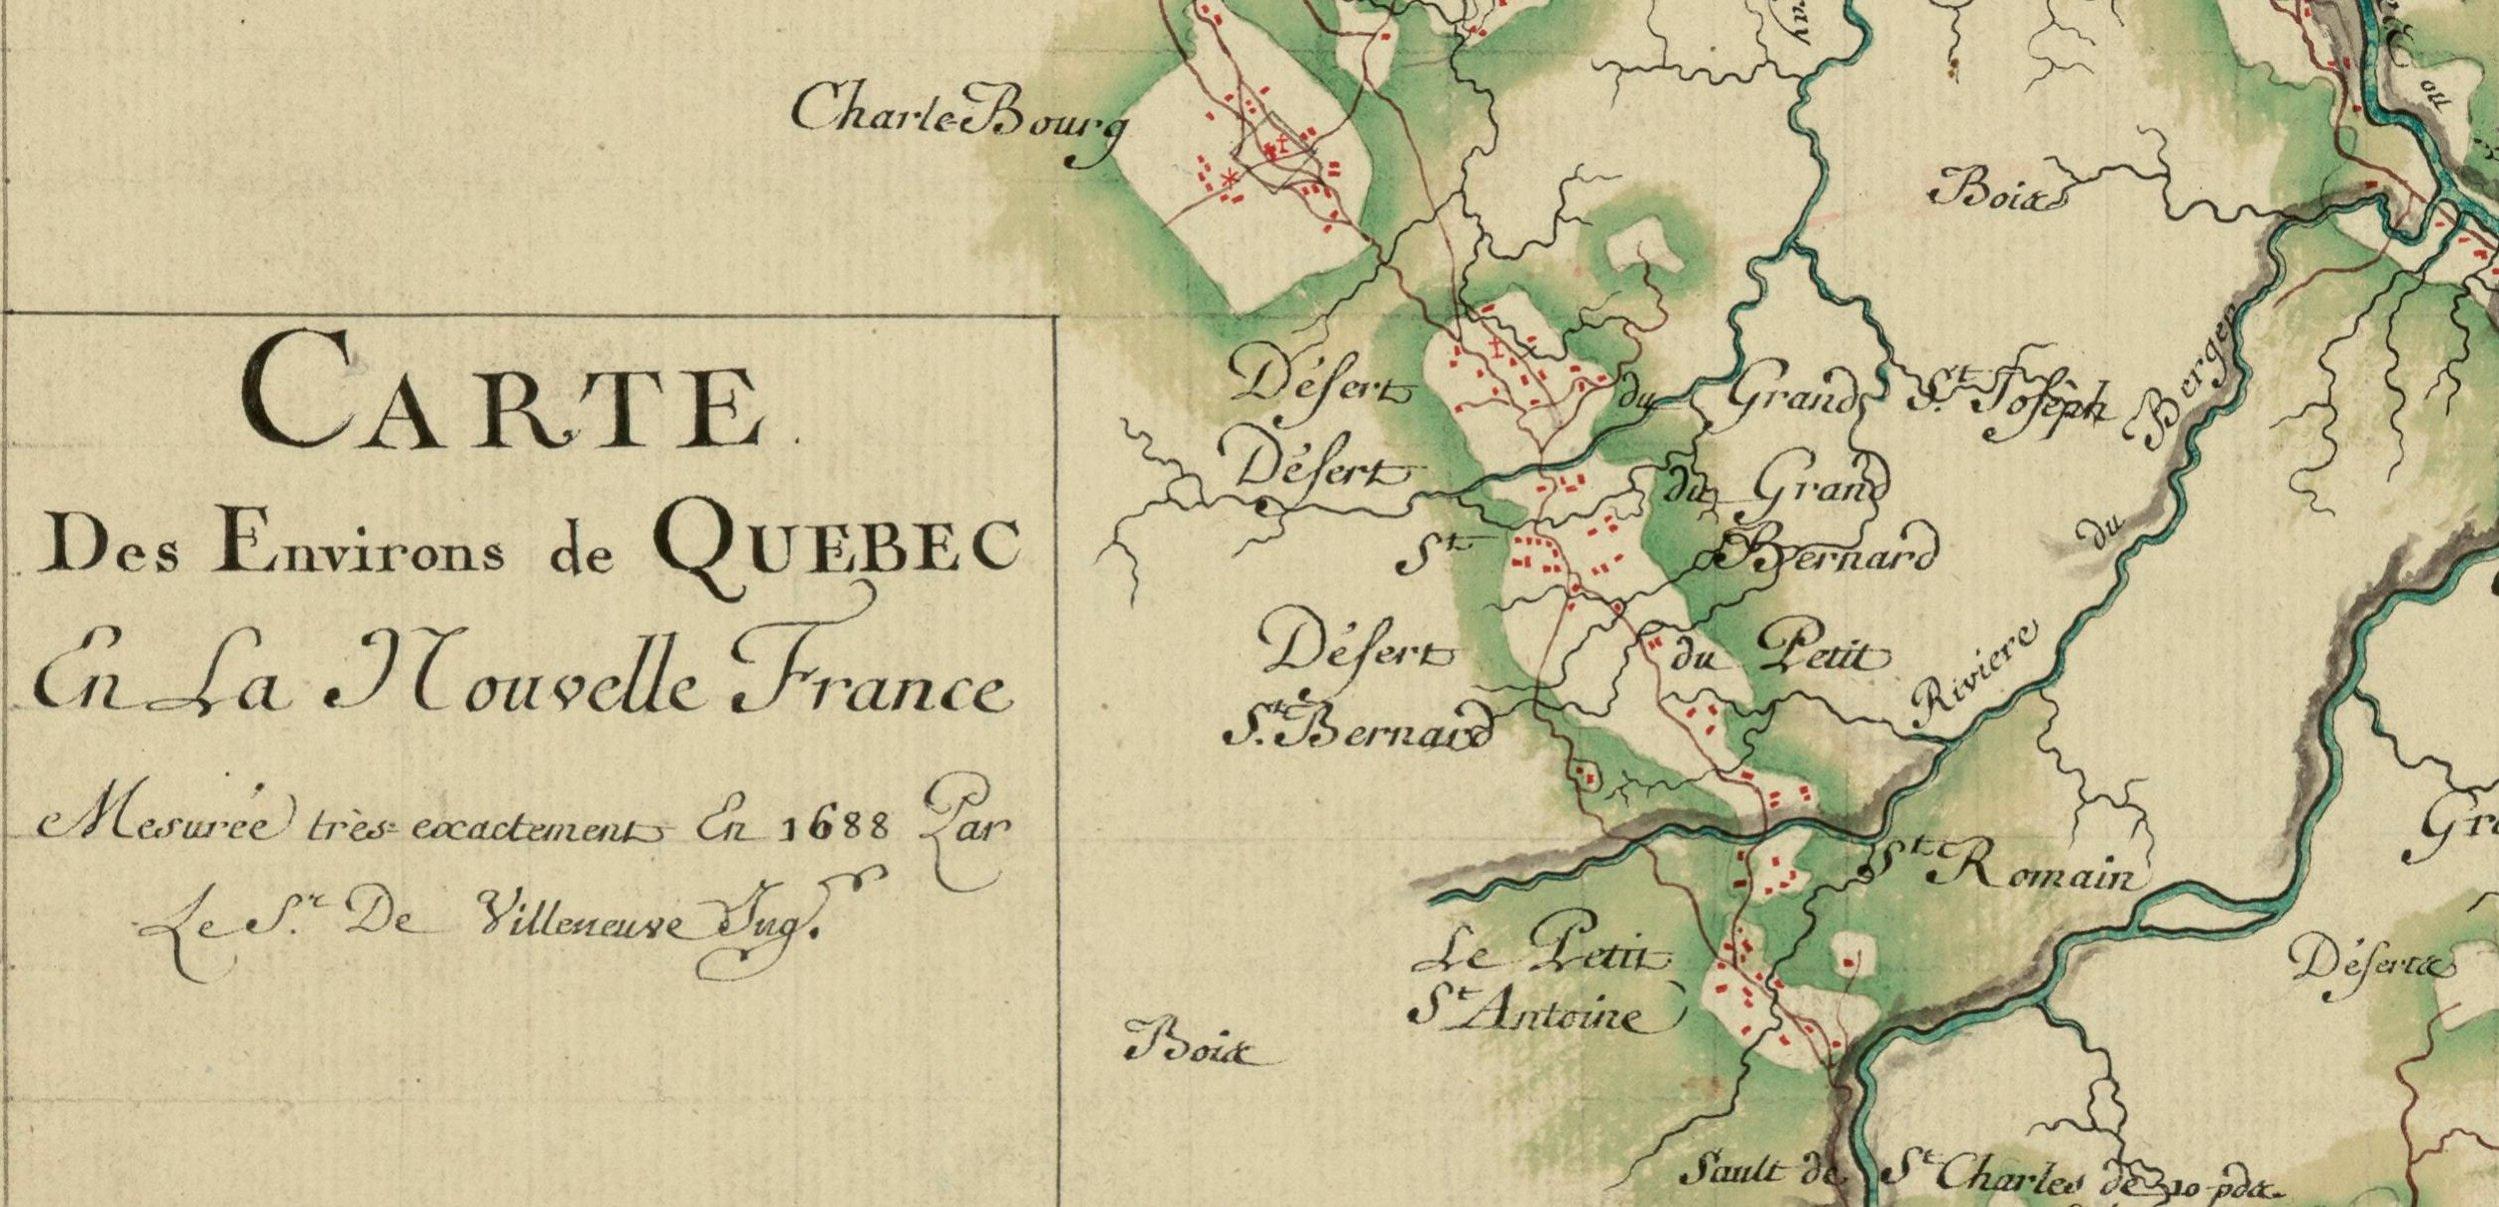 Carte_des_Environs_de_Quebec_%5B...%5DVilleneuve_Robert_btv1b5968897v_1-1.jpg